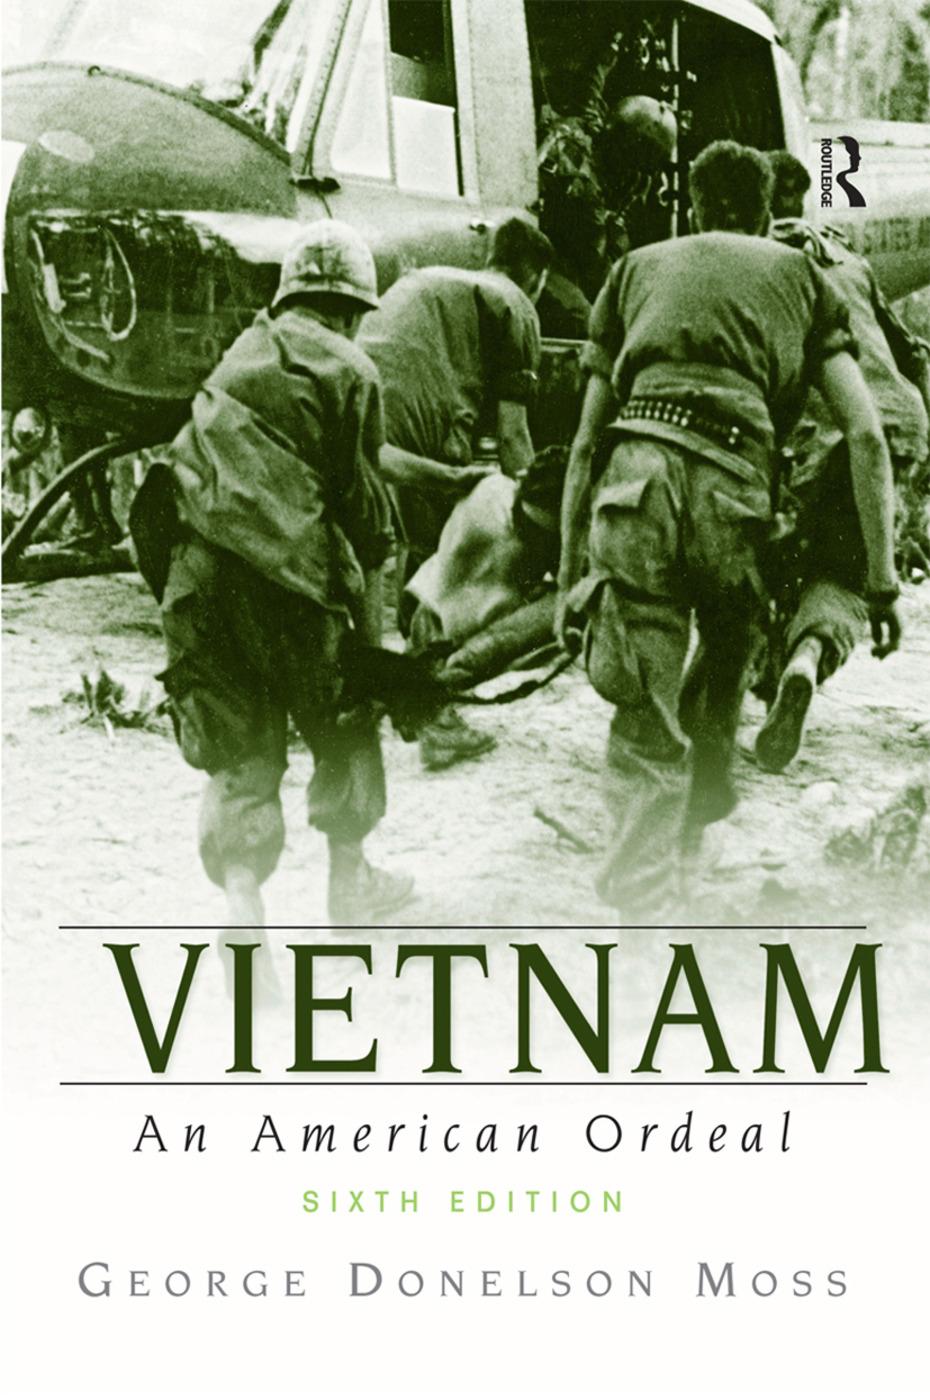 Vietnam: An American Ordeal book cover